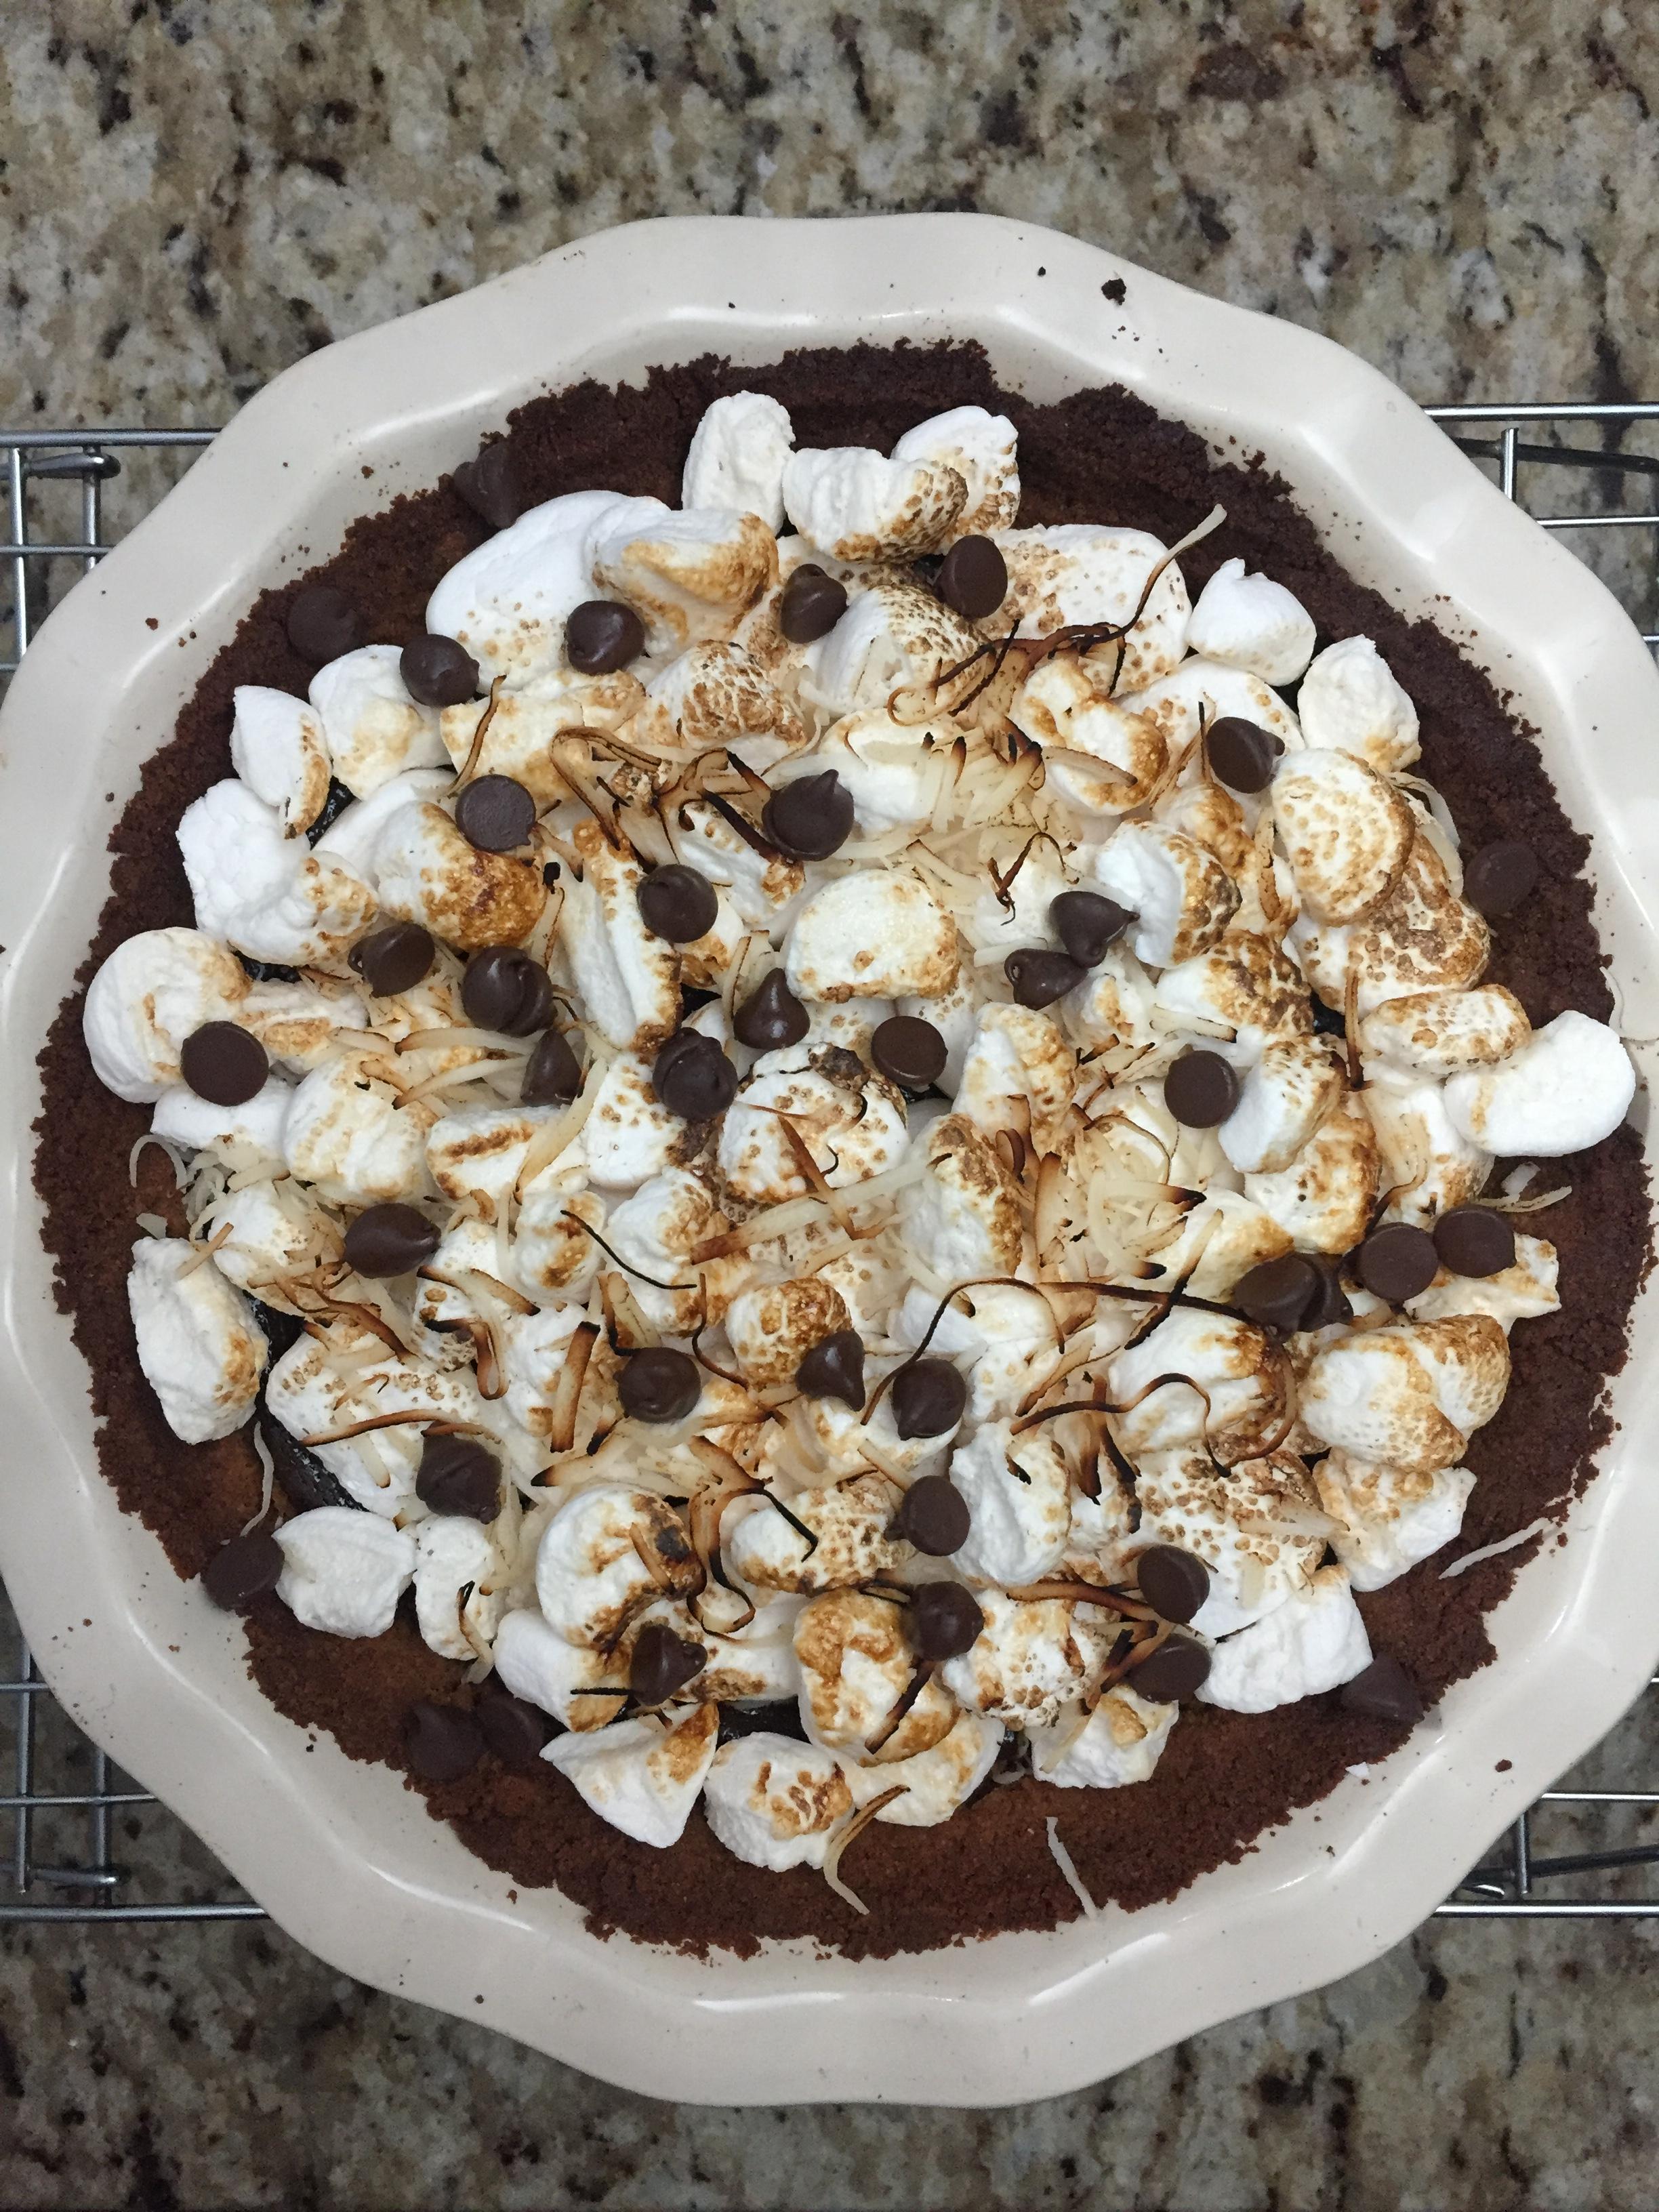 Two Carolines S'mores Pie.JPG